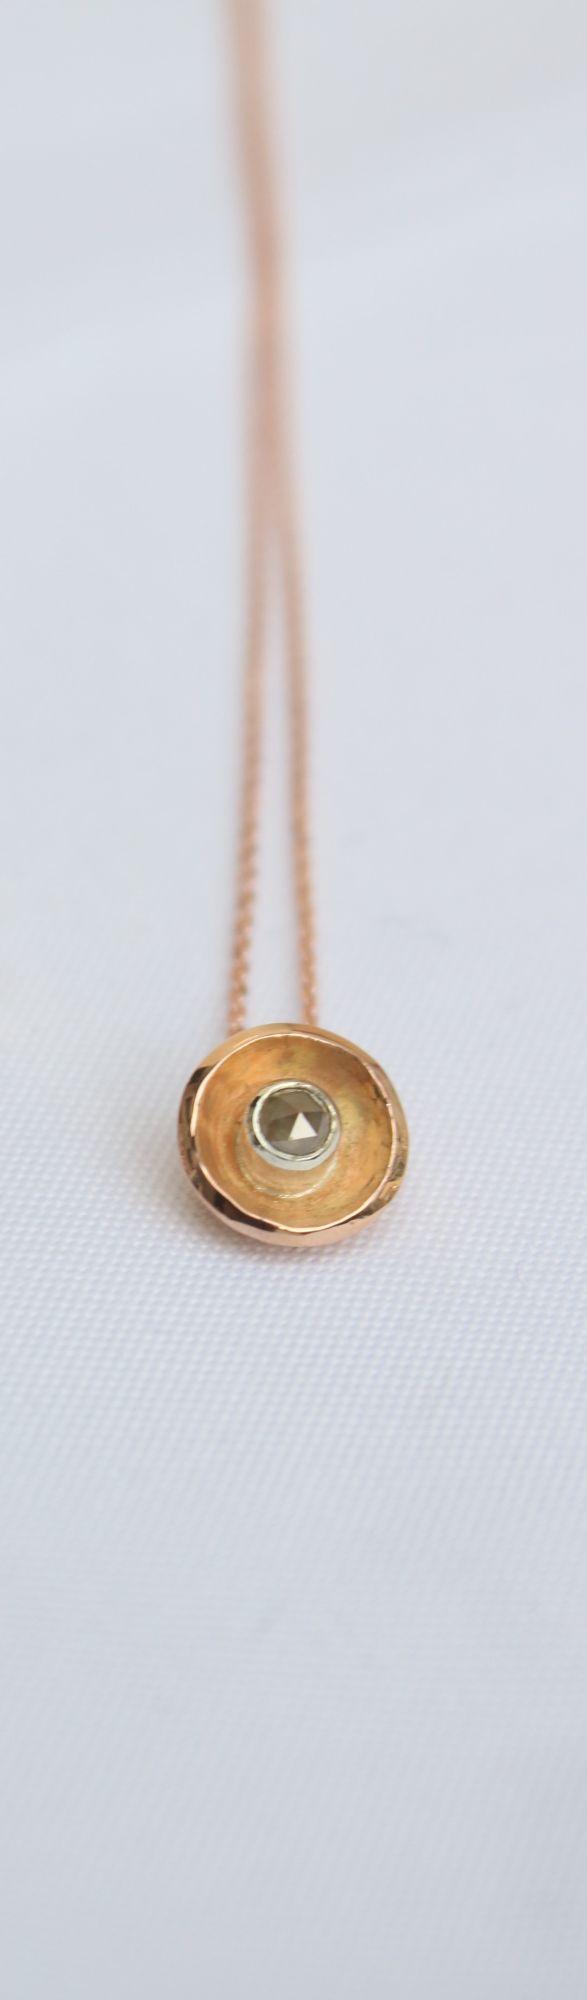 9ct gold. Single stone diamond pendant